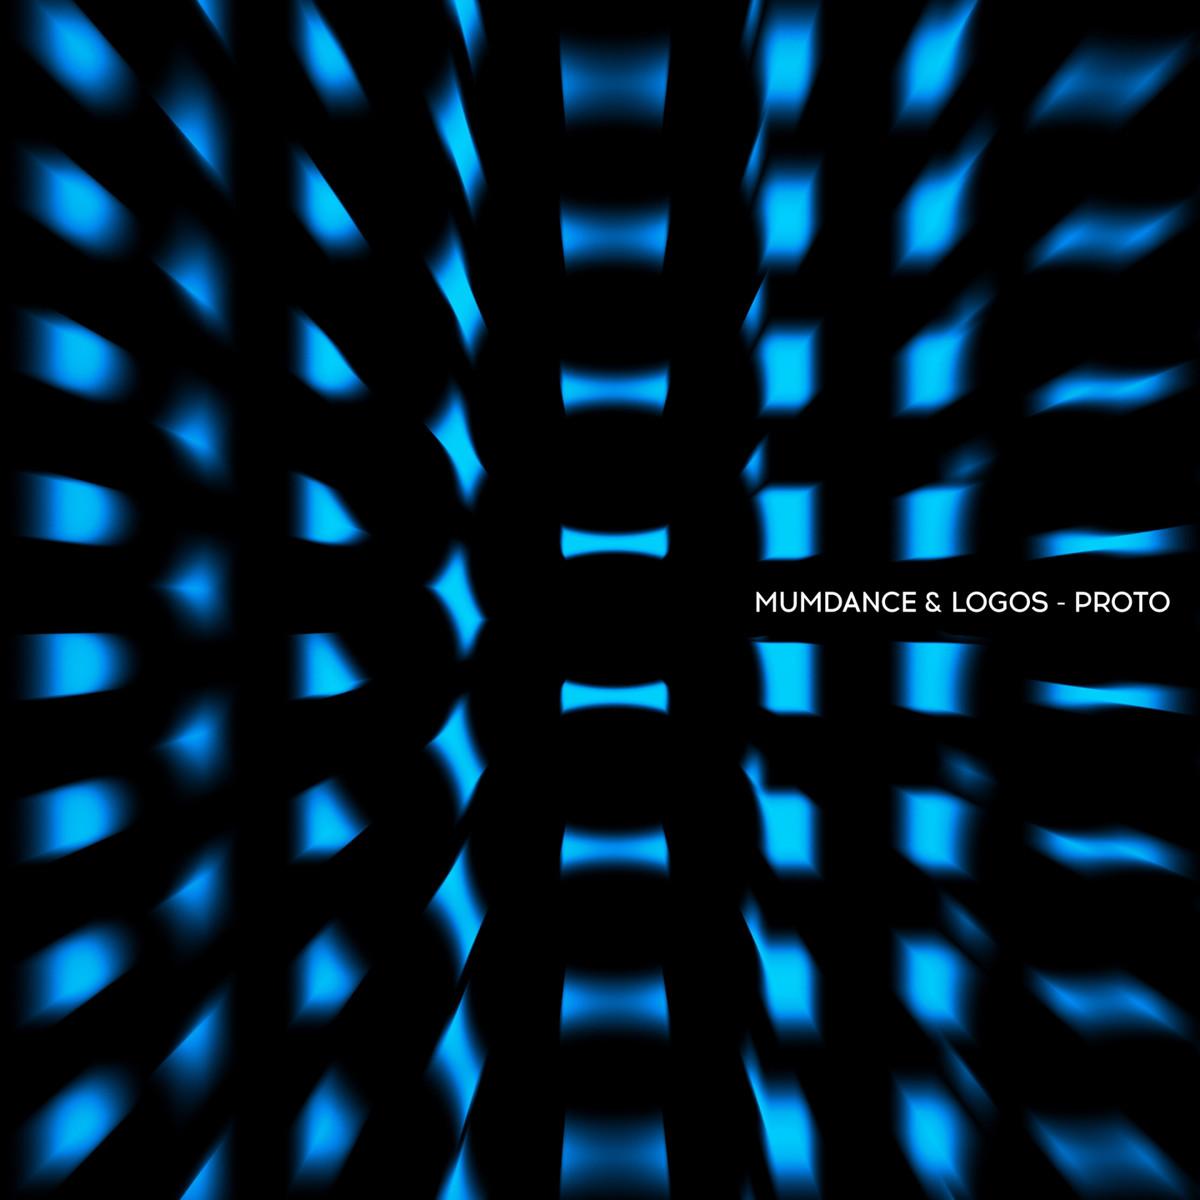 Logos & Mumdance - Proto / Review